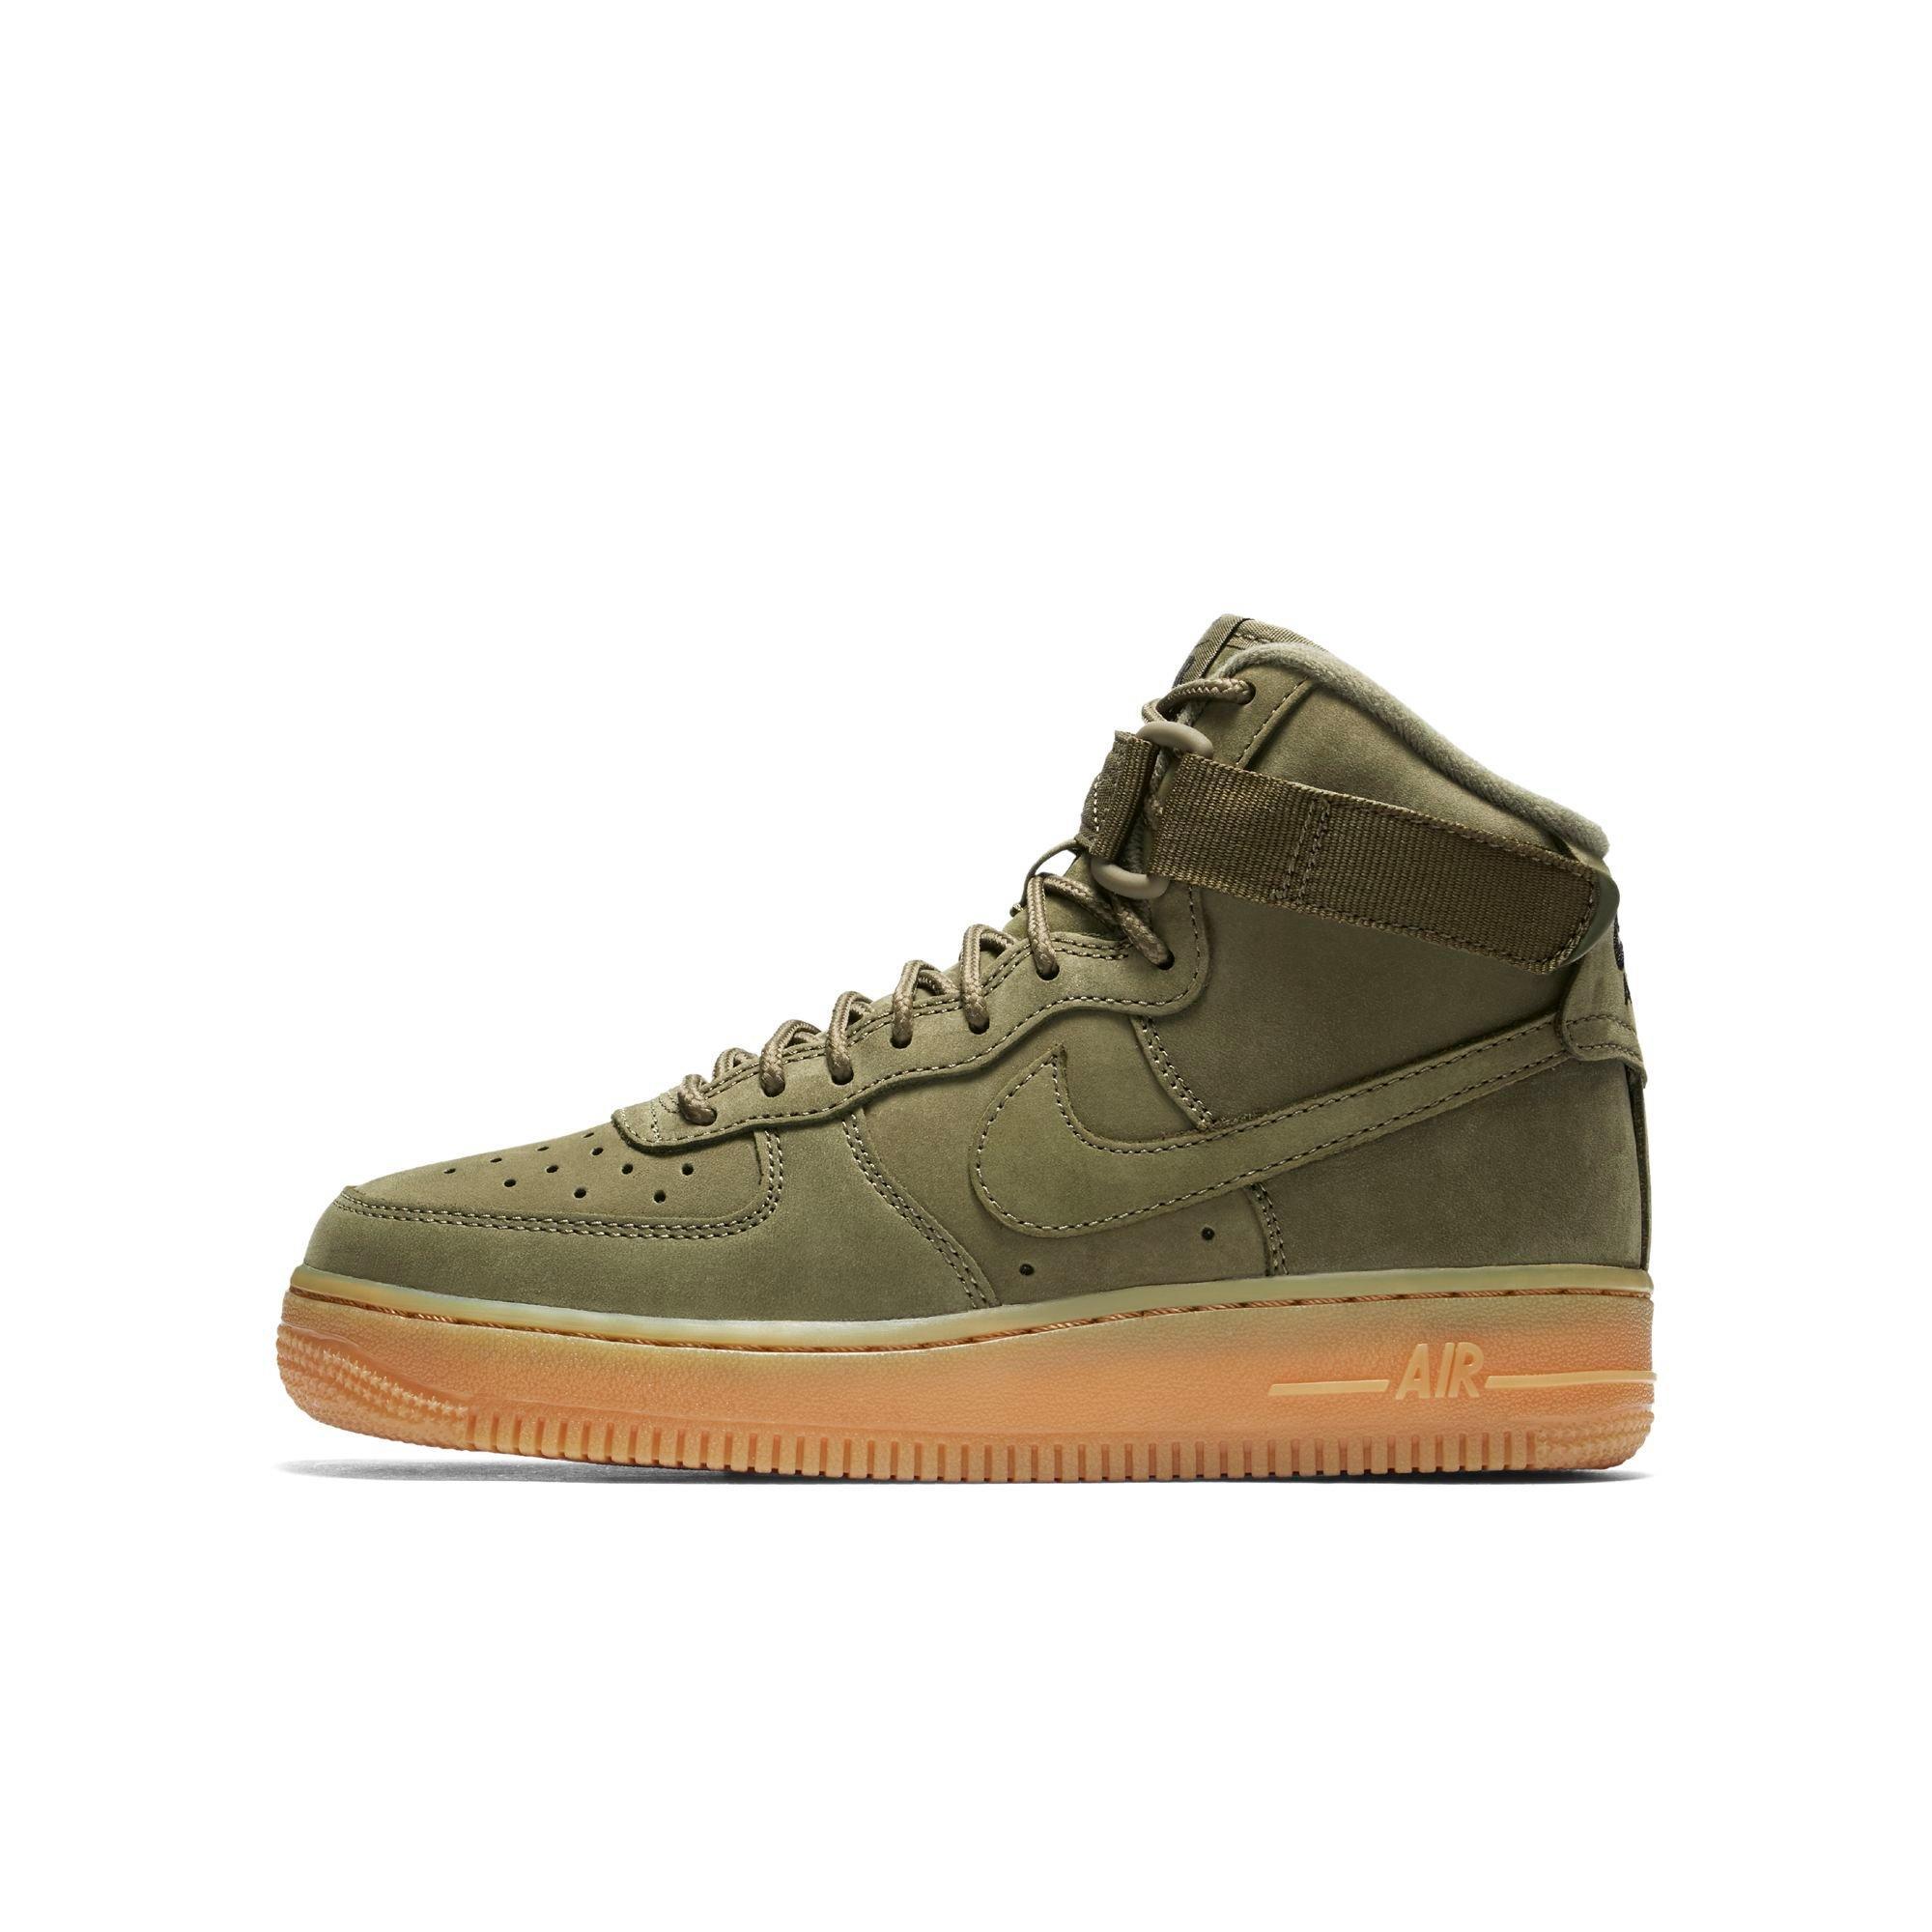 b48db7b5fbe Boys Air Force 1 Sneakers